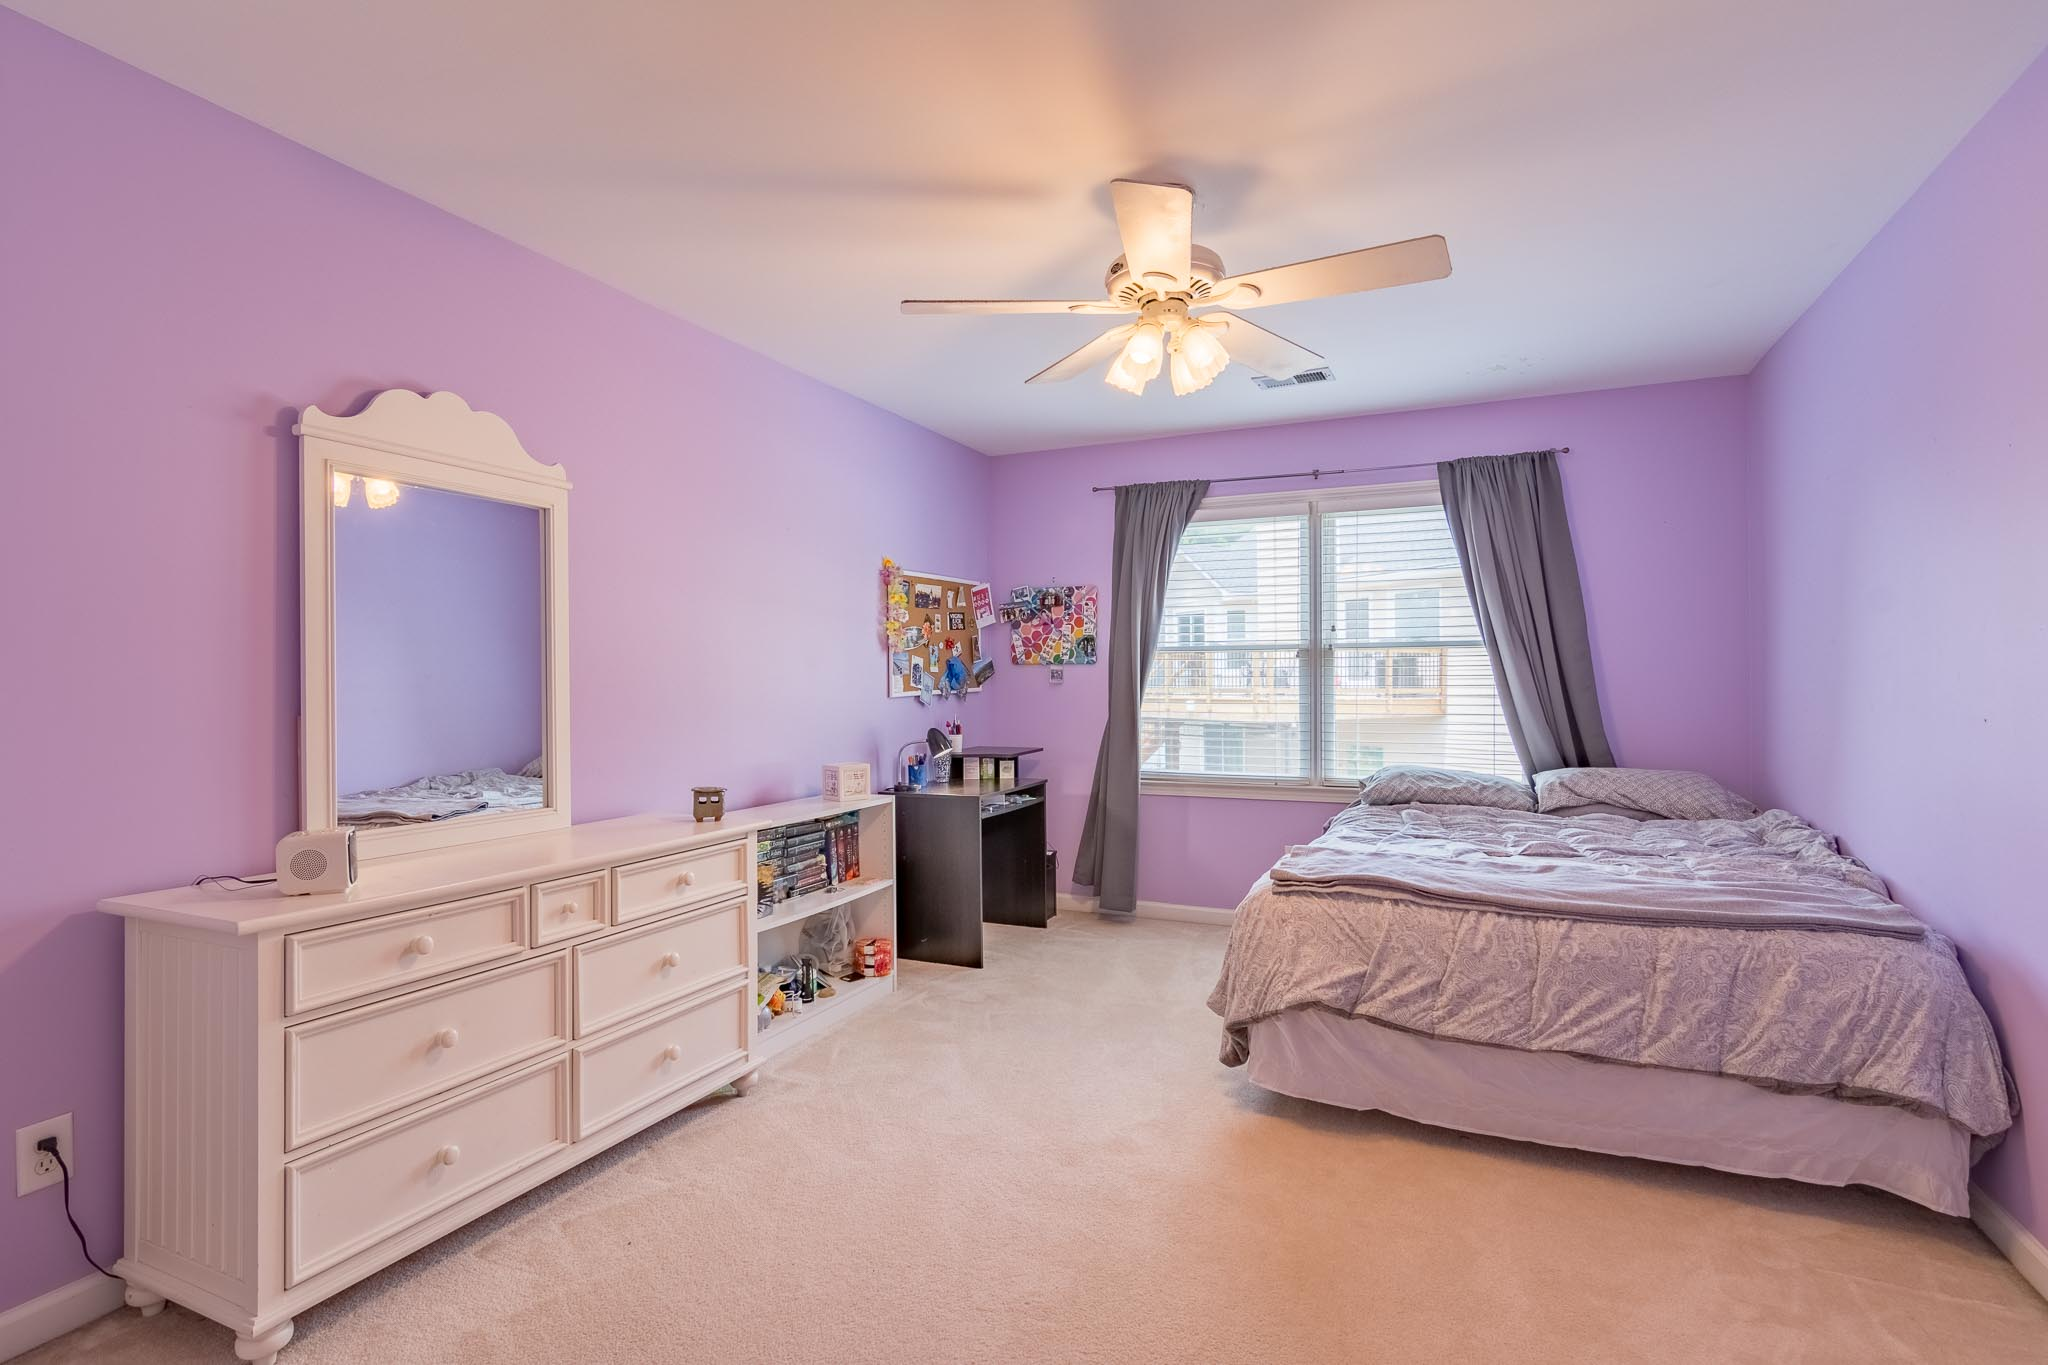 real_estate_photographer_bedroom_photography-10.jpg